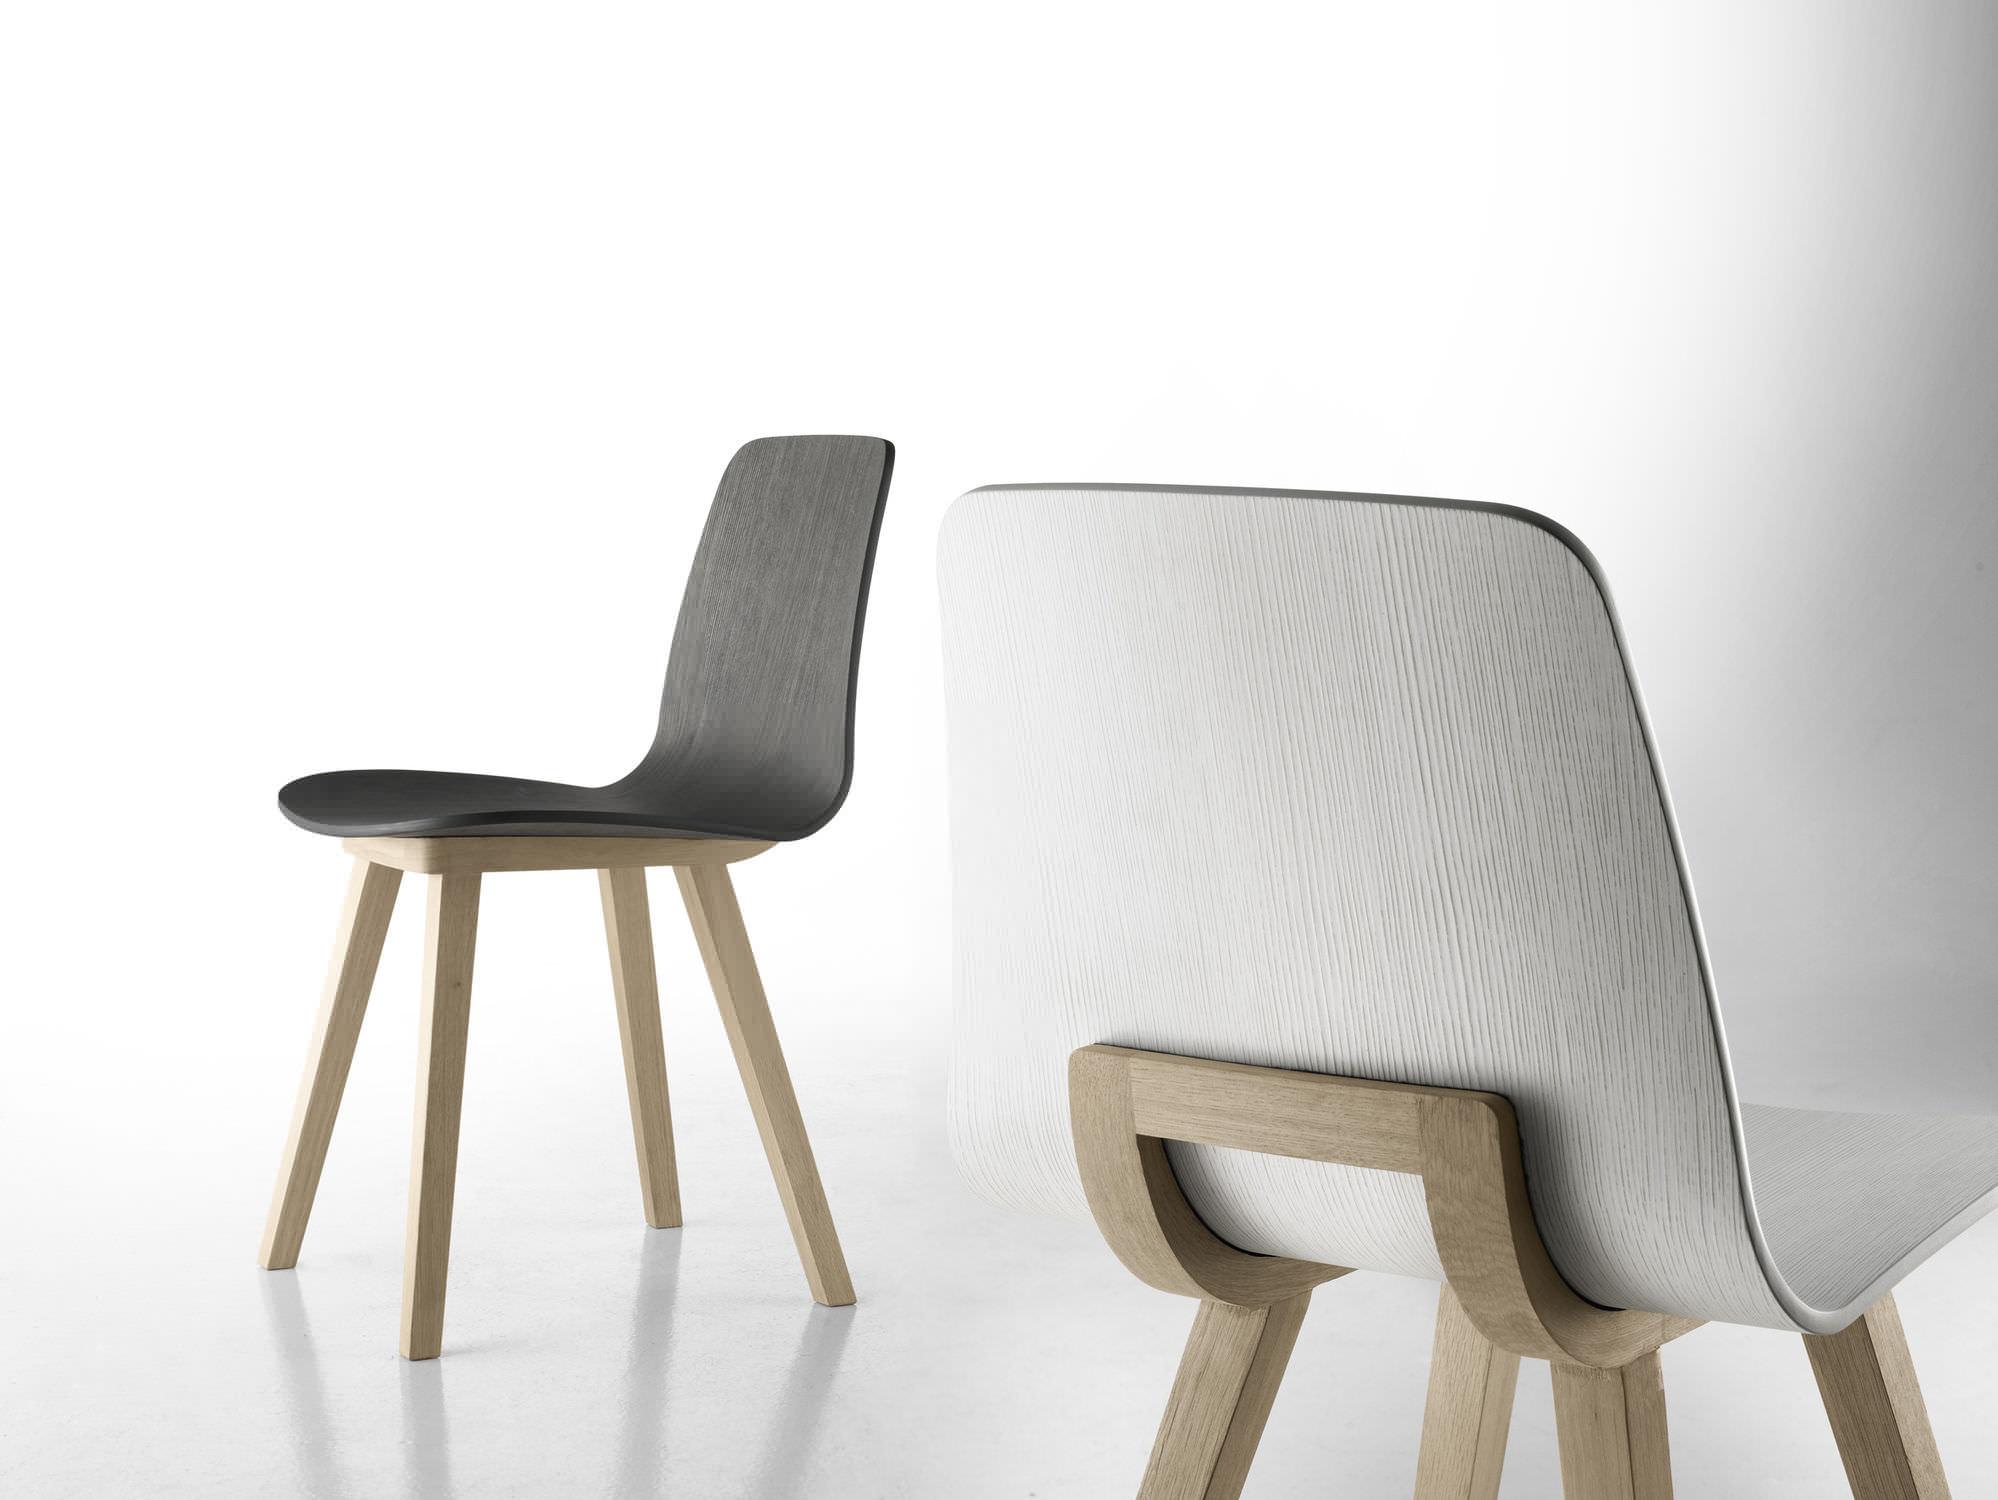 silla kuskoa mbit. Black Bedroom Furniture Sets. Home Design Ideas